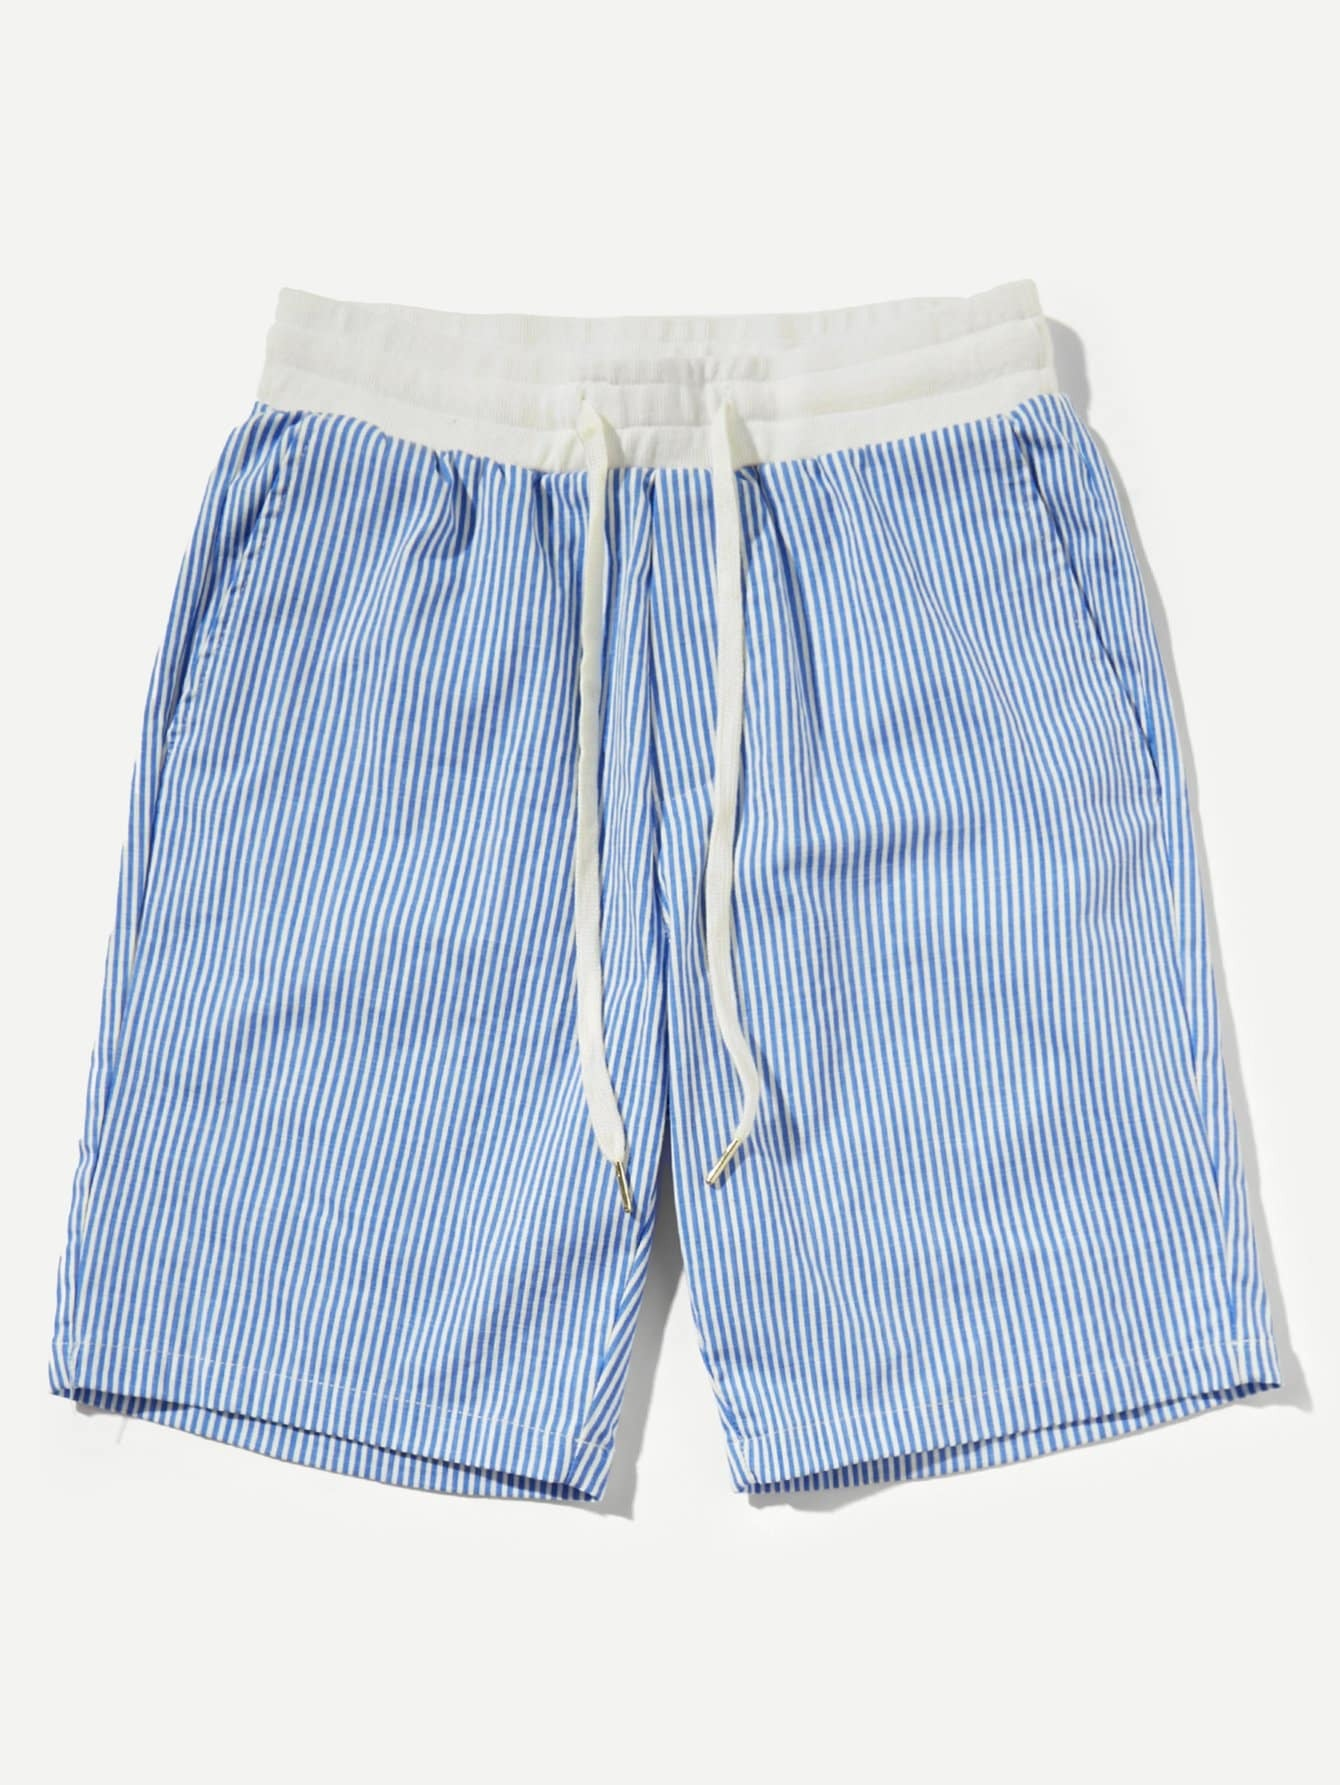 Men Contrast Drawstring Waist Striped Shorts men colorful striped drawstring shorts